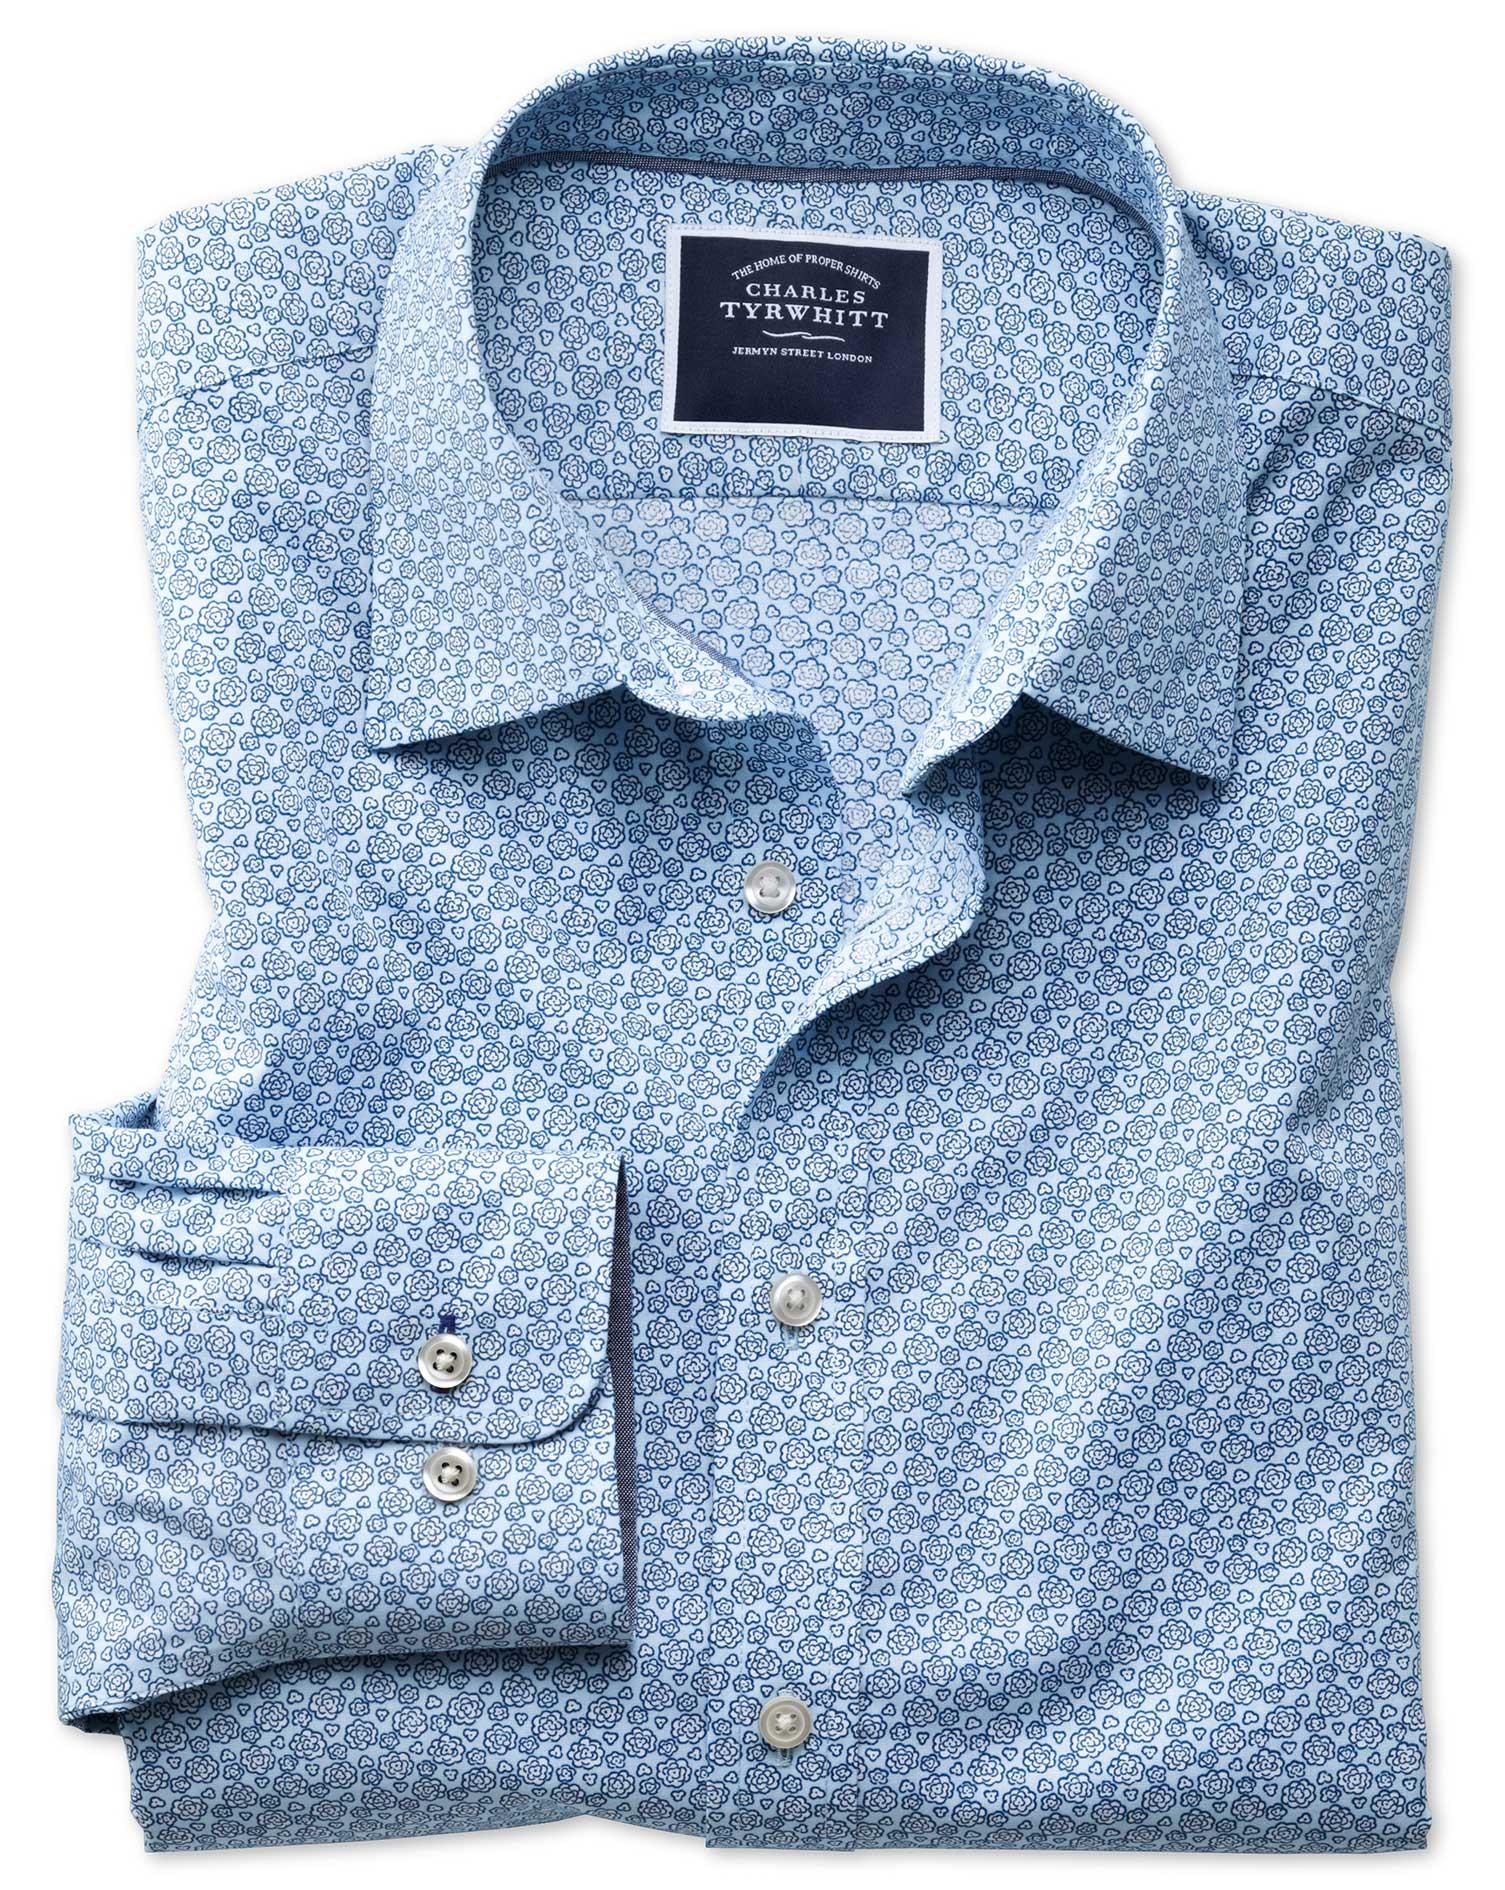 Classic Fit Non-Iron Poplin Light Blue Floral Print Cotton Shirt Single Cuff Size Medium by Charles